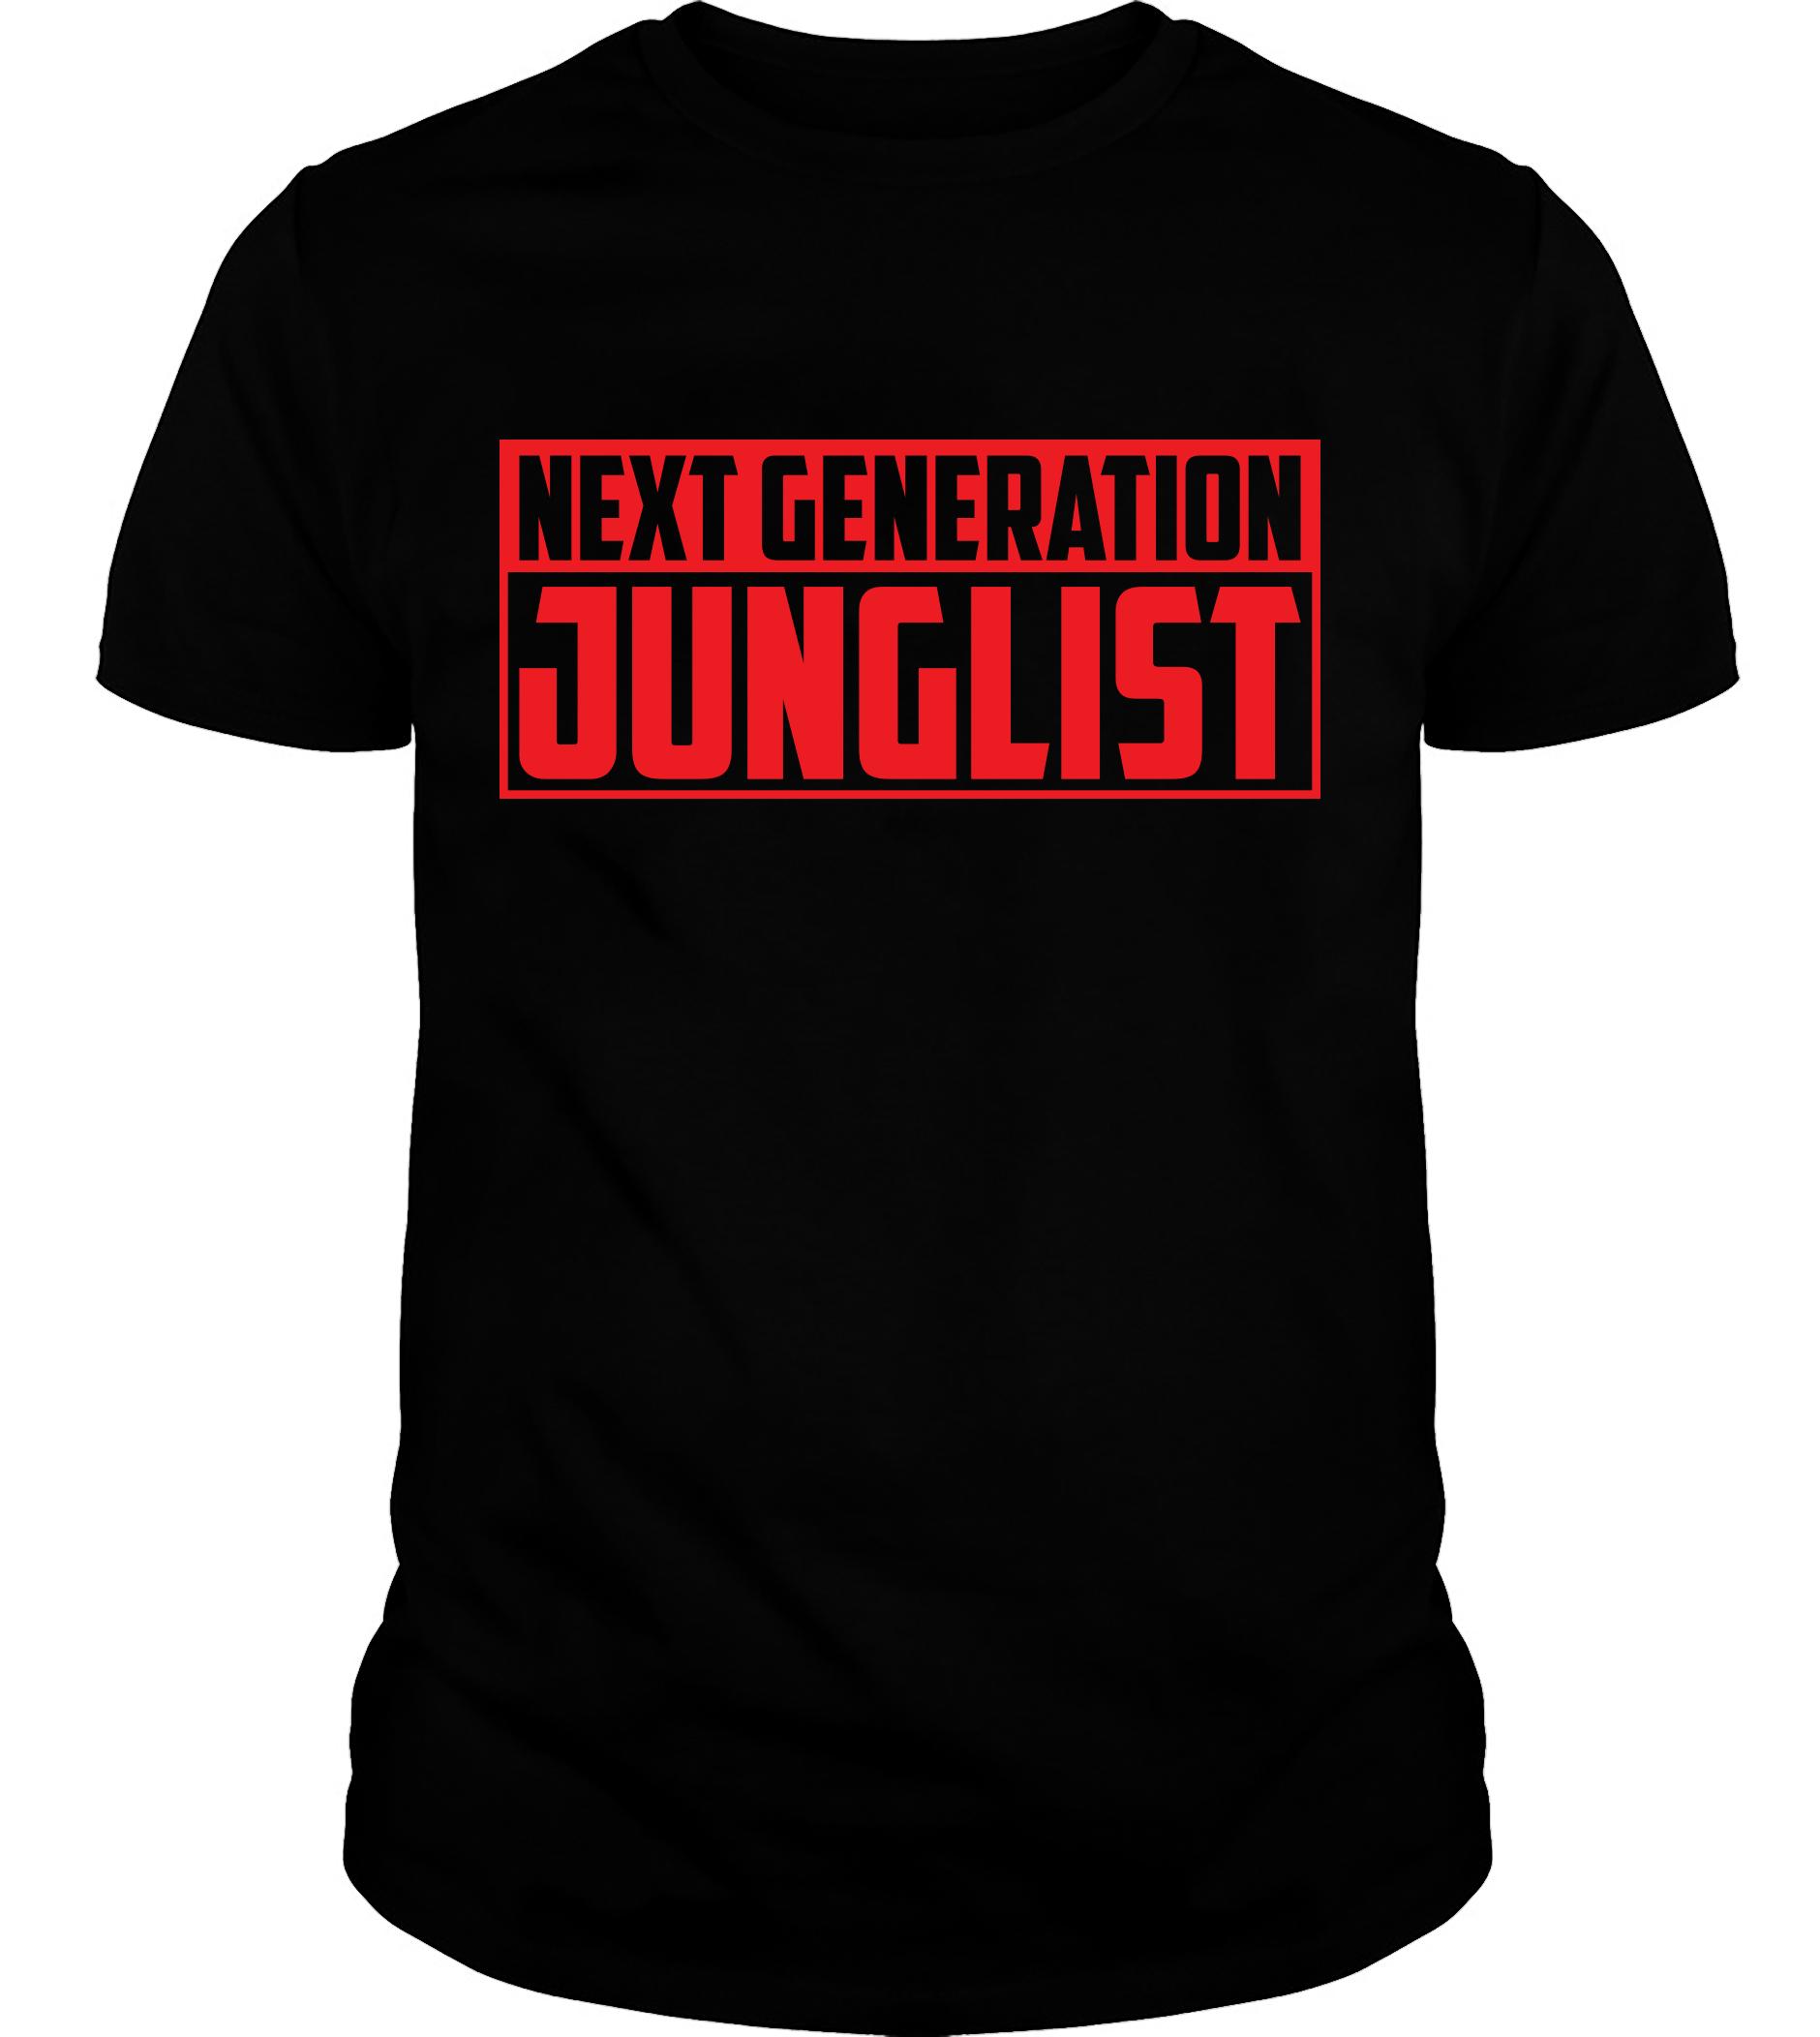 Next Generation Junglist T-SHIRT